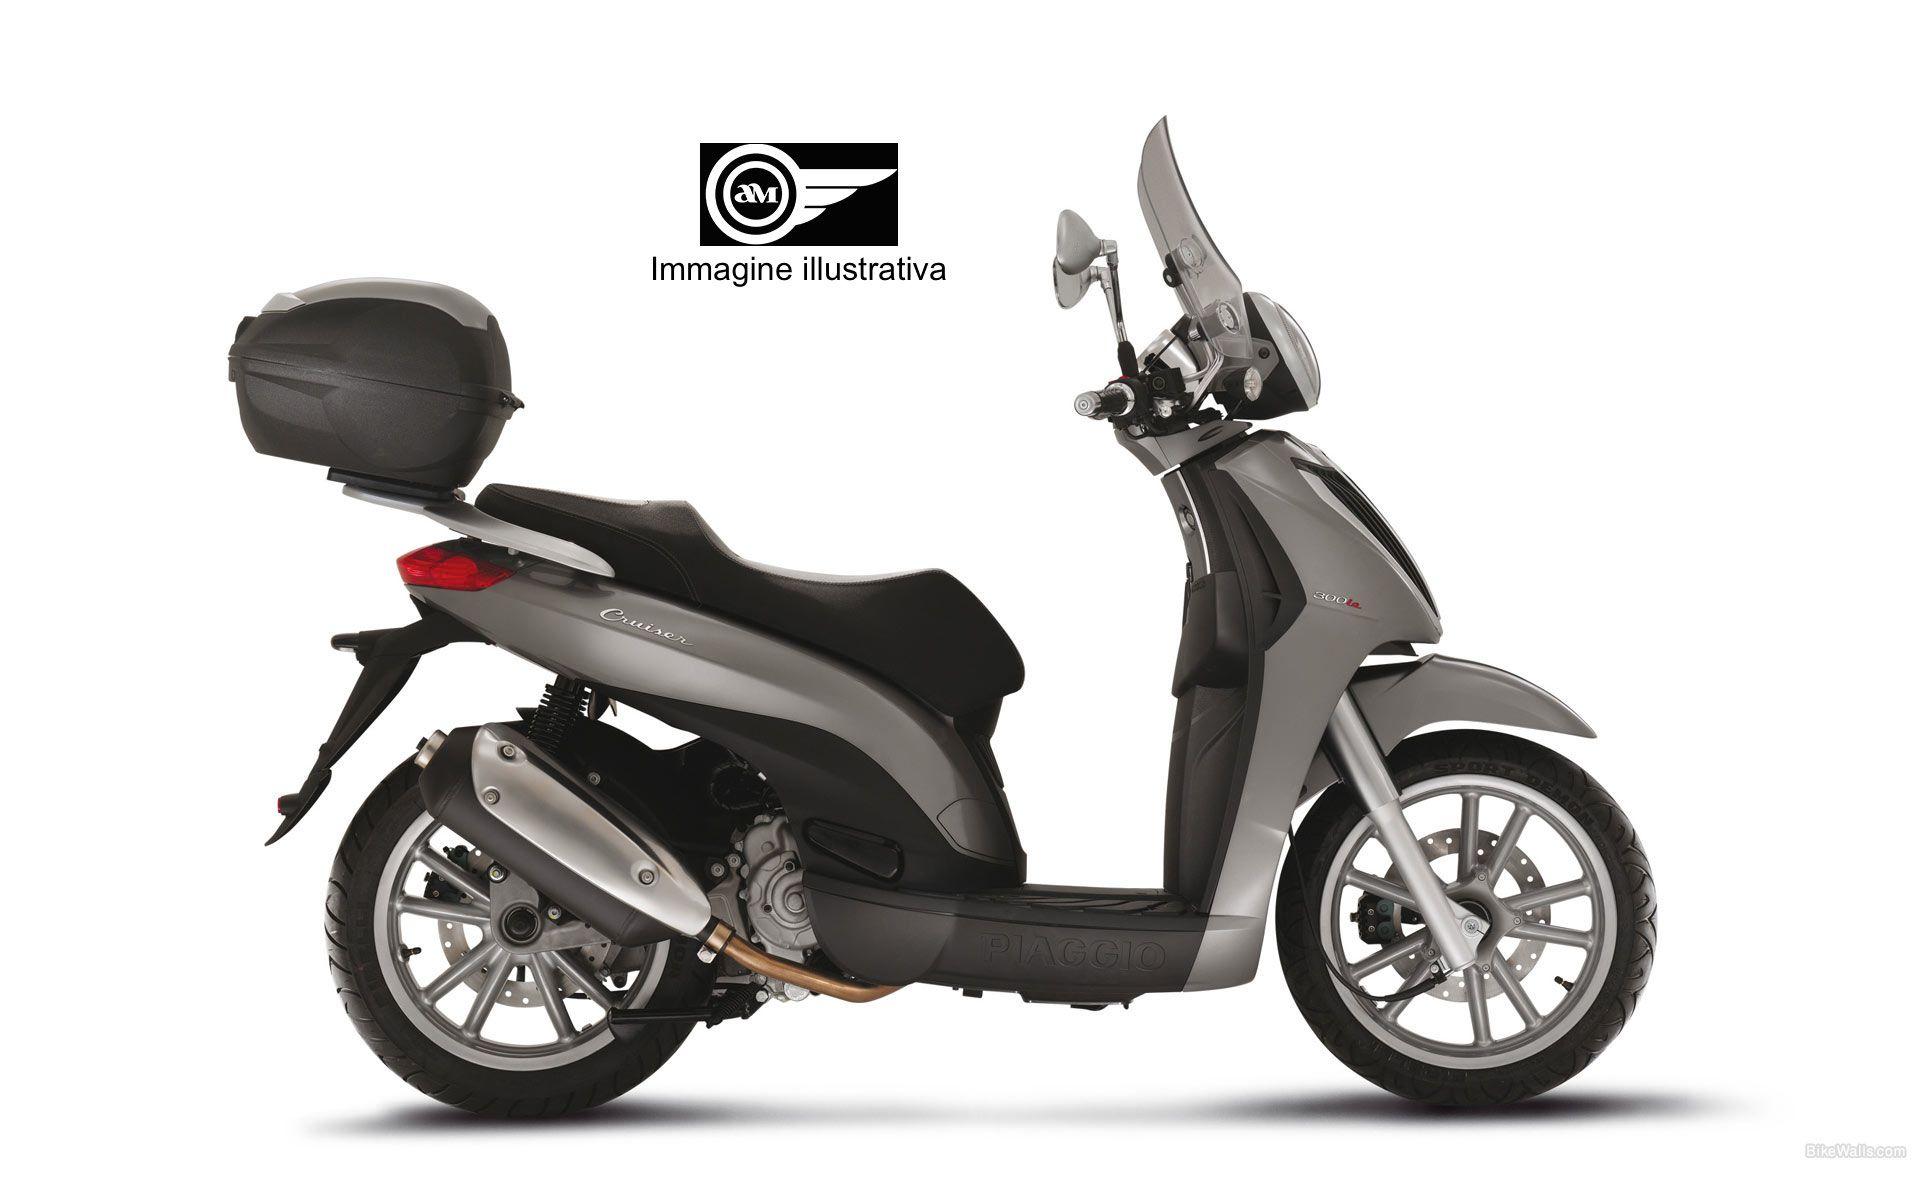 piaggio-carnaby-cruiser-300-6   AM Noleggio scooter   Pinterest ...